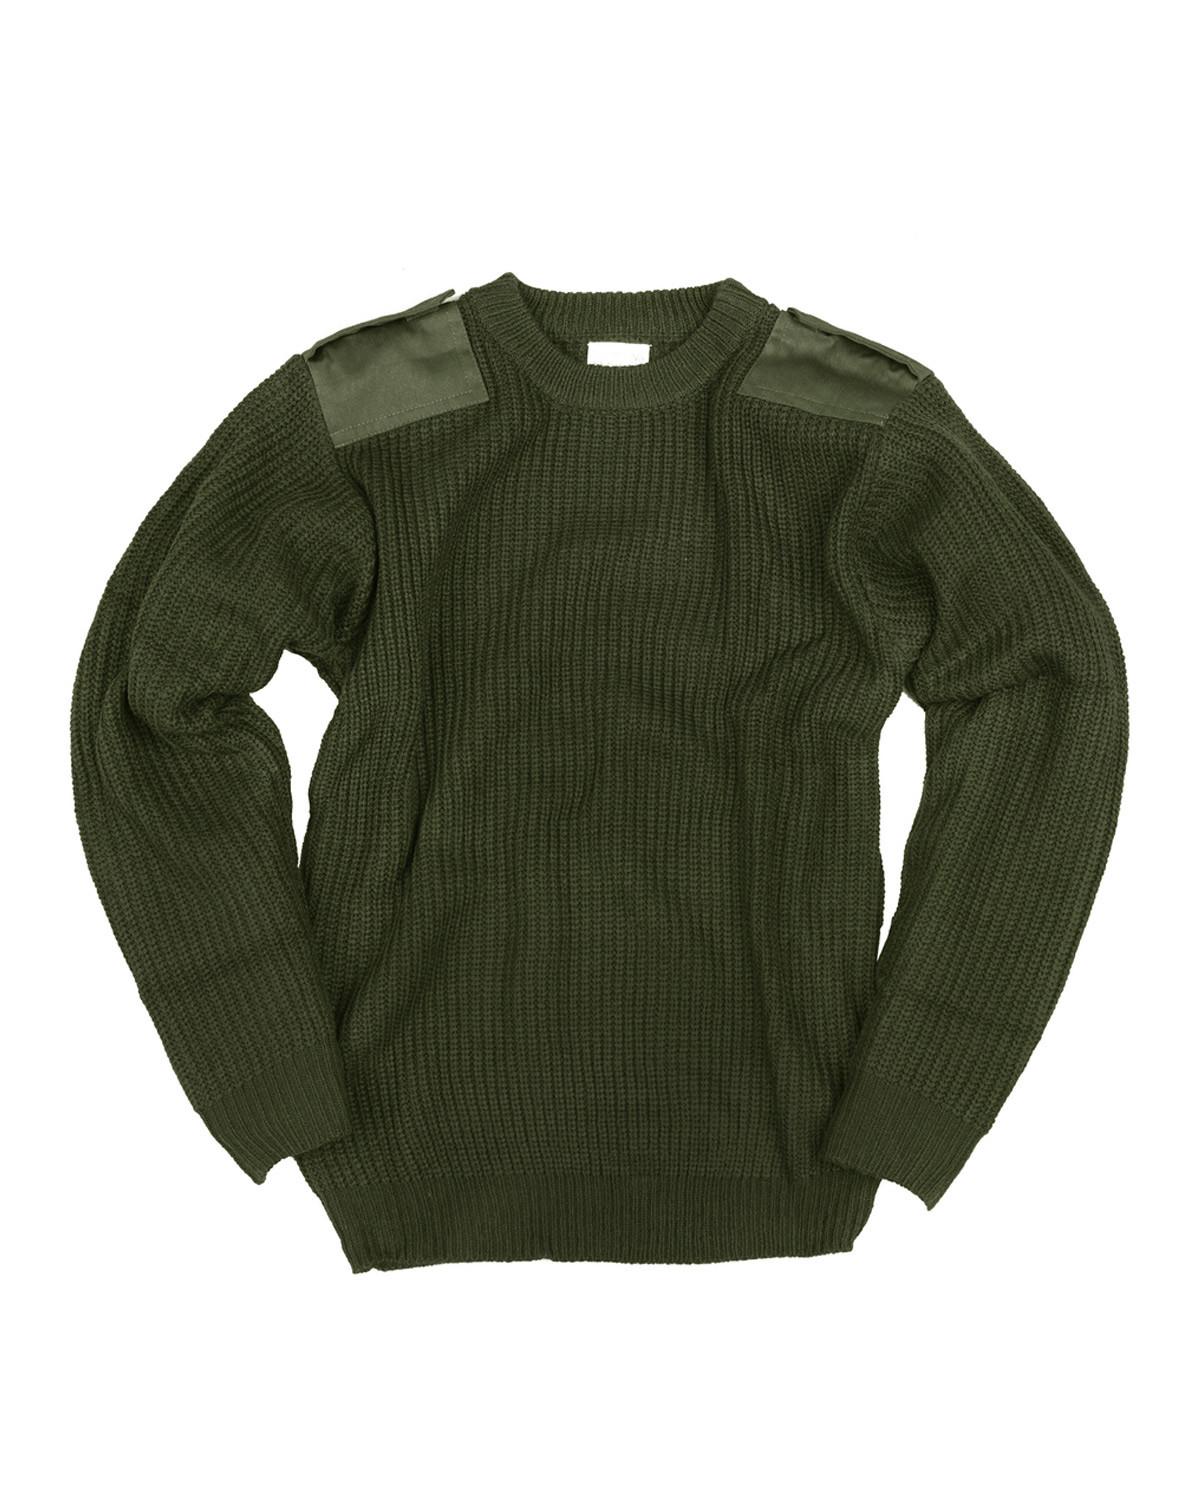 Image of   Fostex Børne Commando Pullover (Oliven, 122)